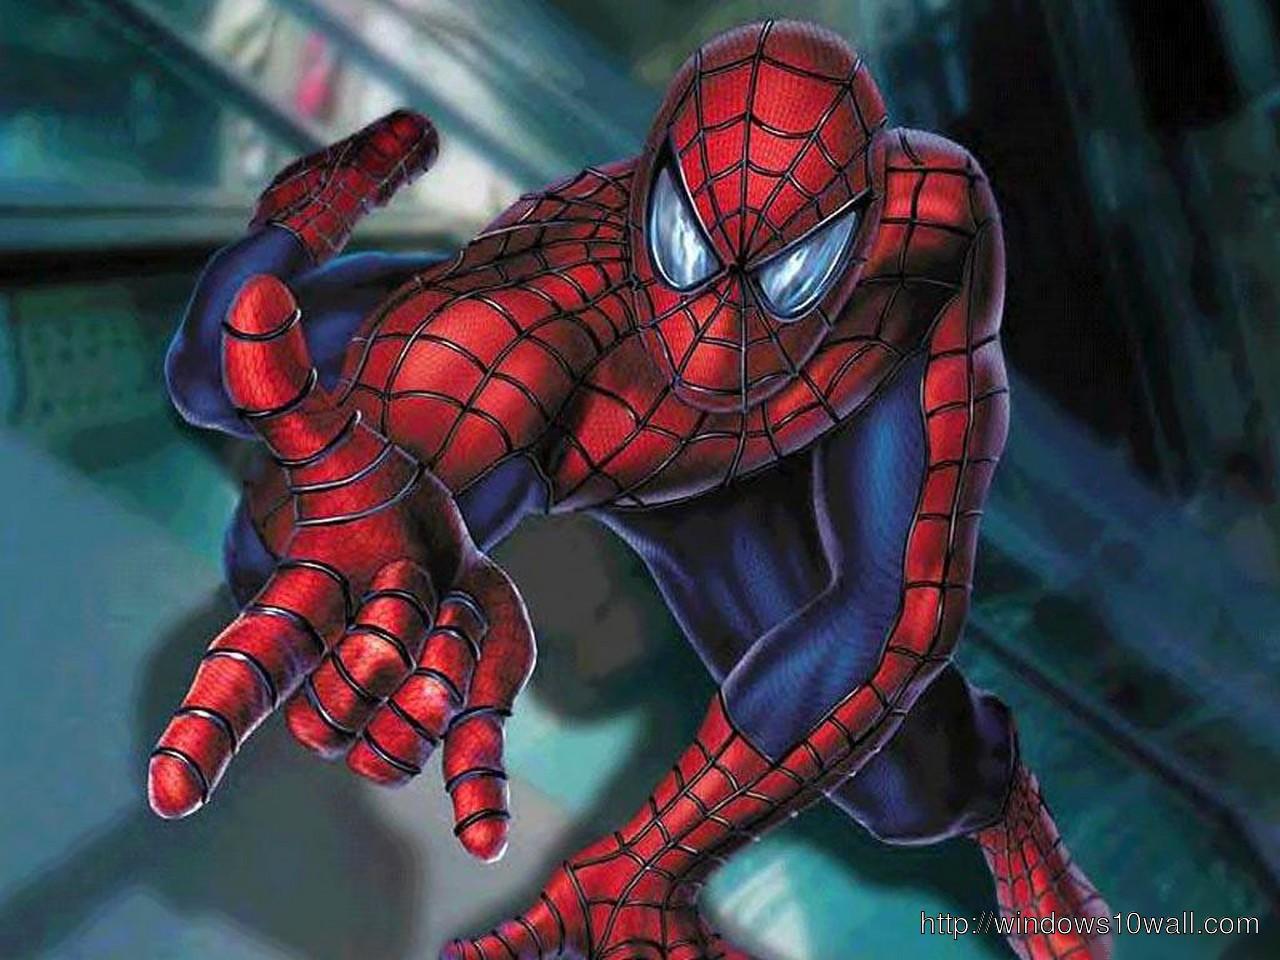 Spiderman In Action Wallpaper Windows 10 Wallpapers